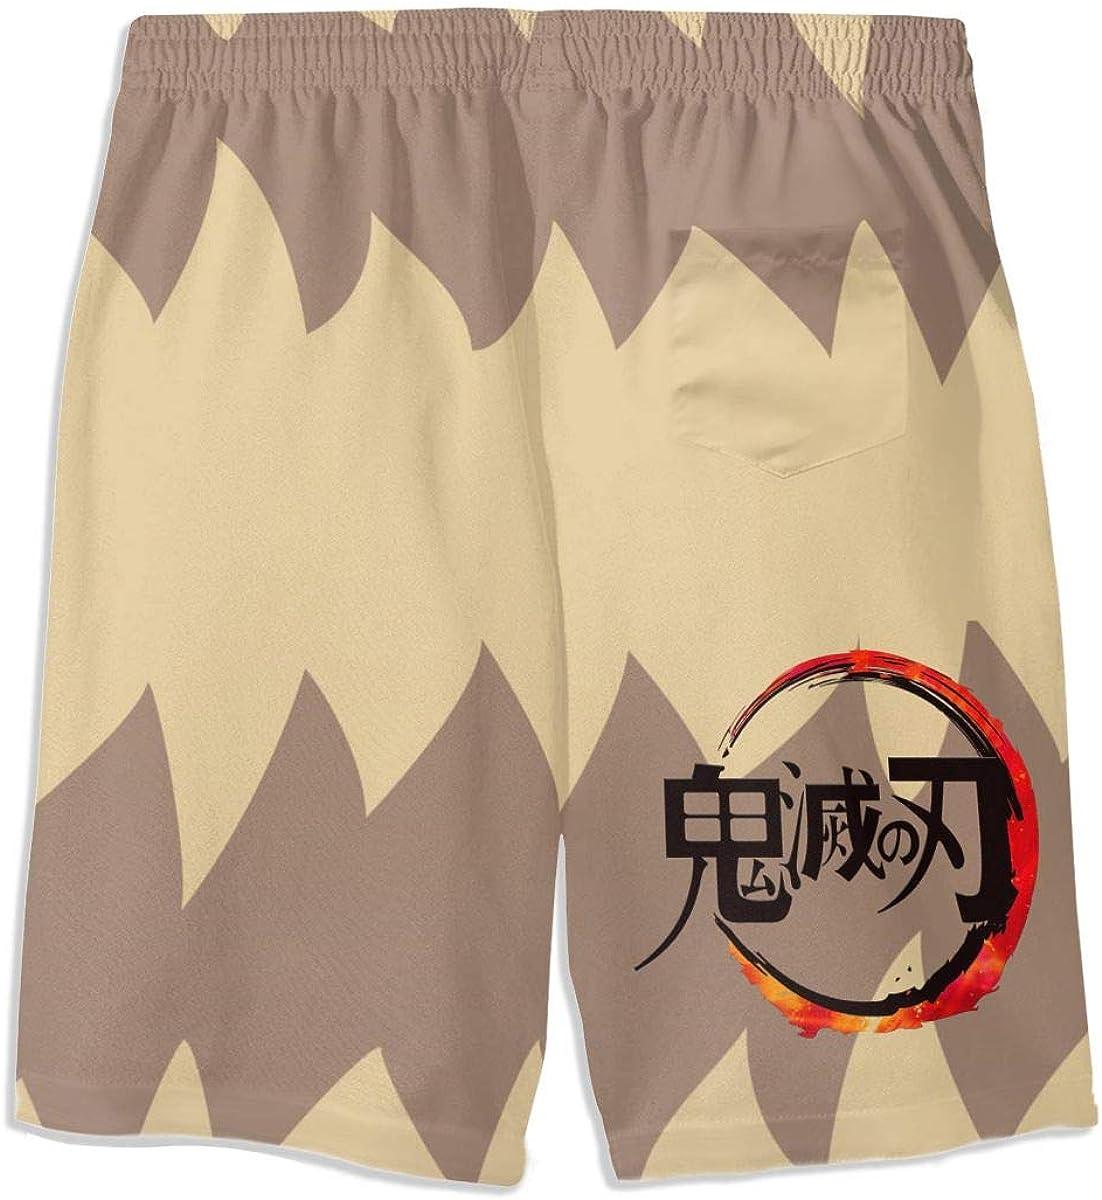 Muindancer Cartoon Characters Youth Boys 3D Print Shorts Summer Beach Shorts Casual Pants Quick Dry Swim Trunk